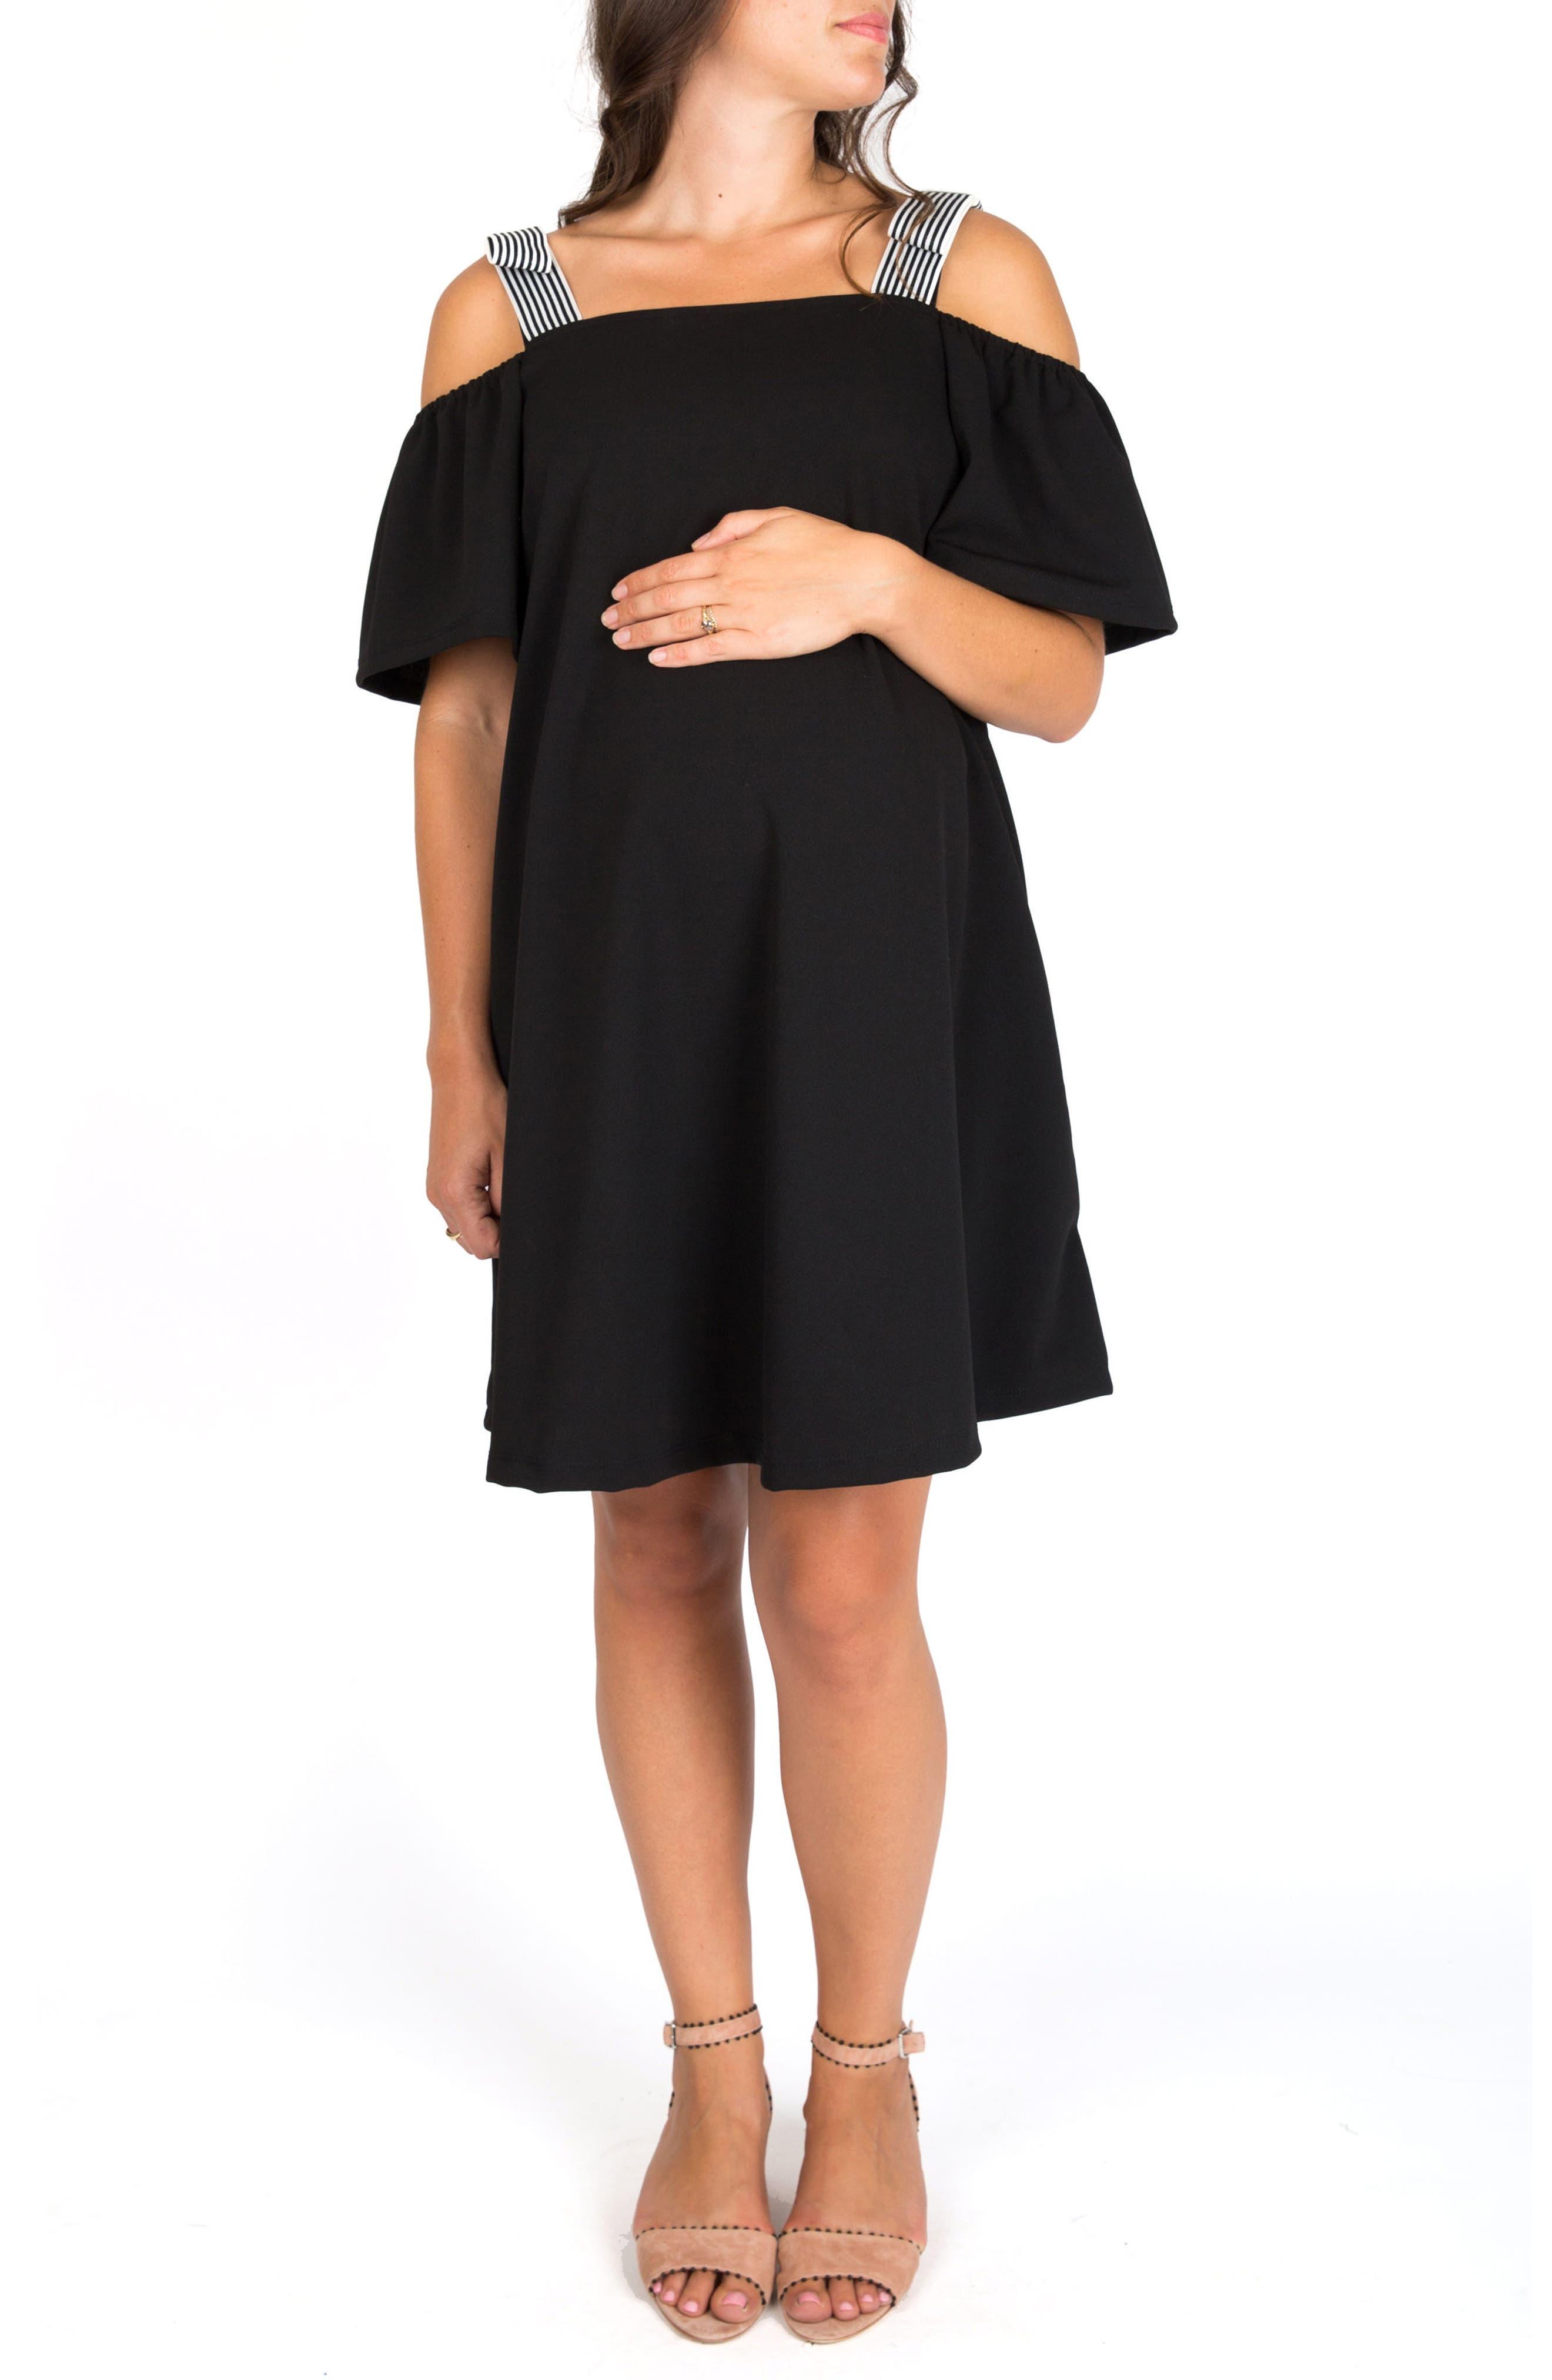 NOM MATERNITY,                             Millie Off the Shoulder Maternity Dress,                             Main thumbnail 1, color,                             BLACK